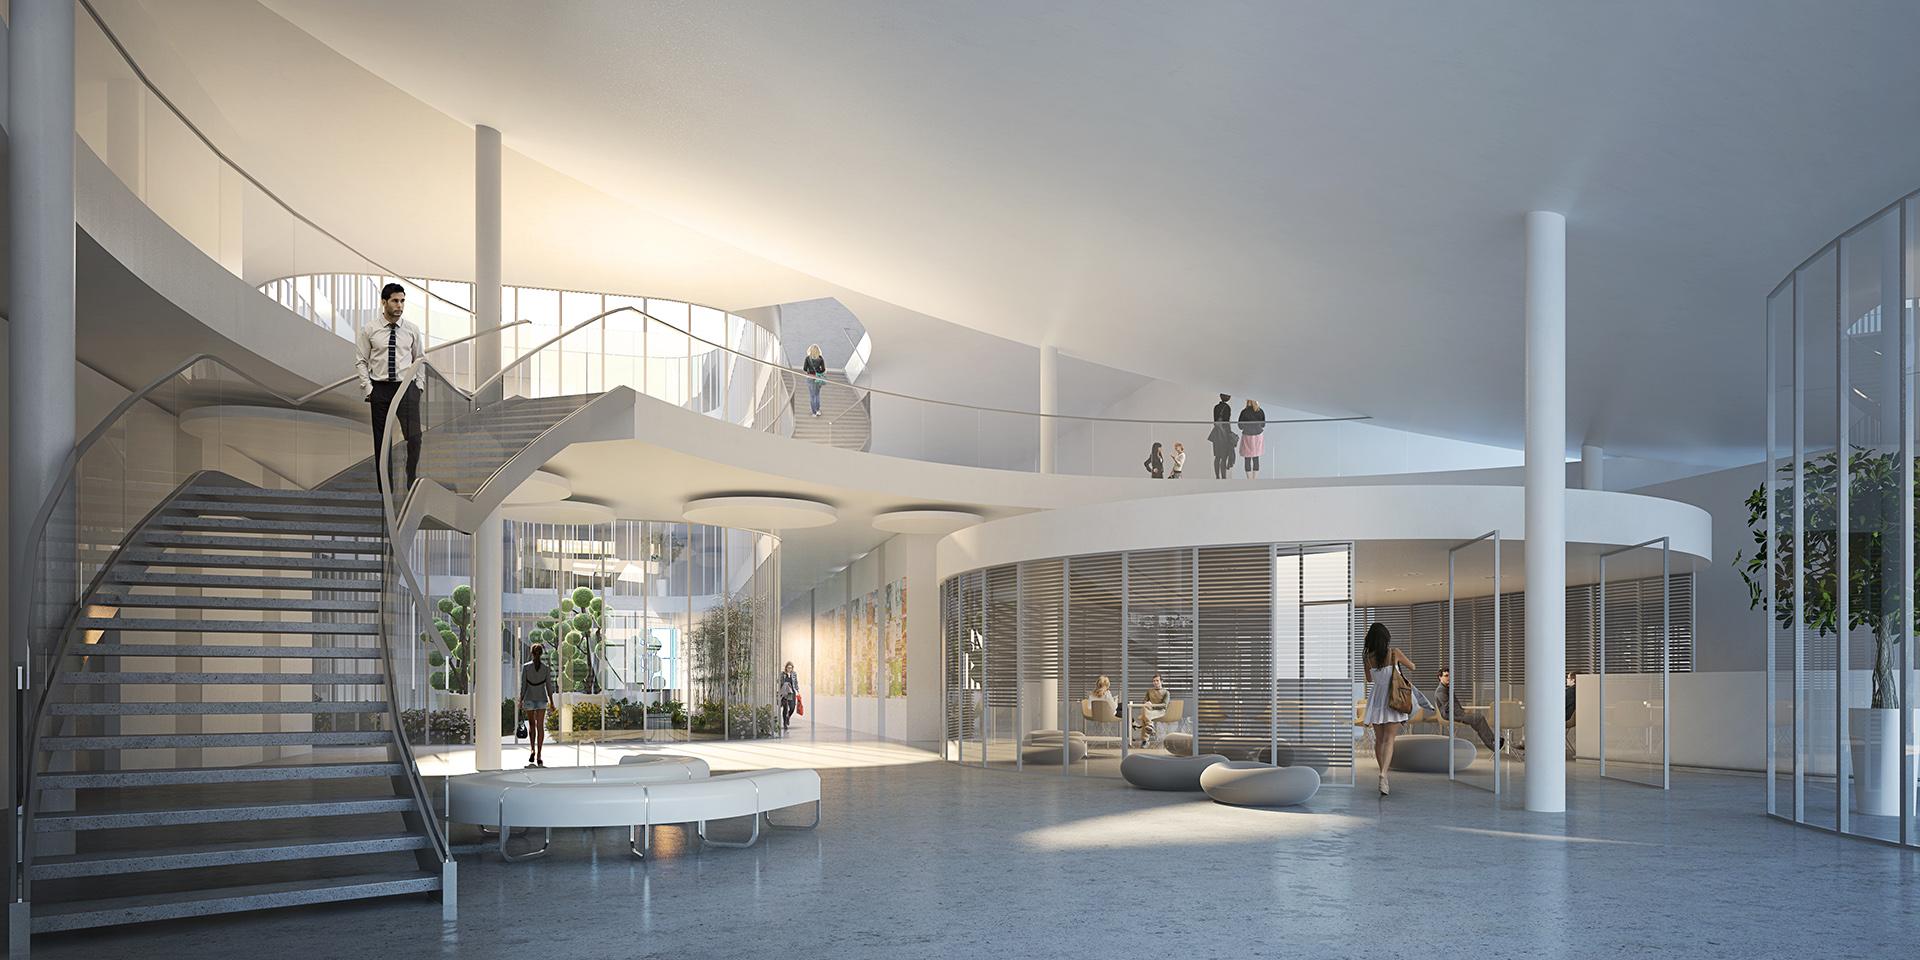 Maison architecte grenoble maison moderne for Architecte d interieur grenoble